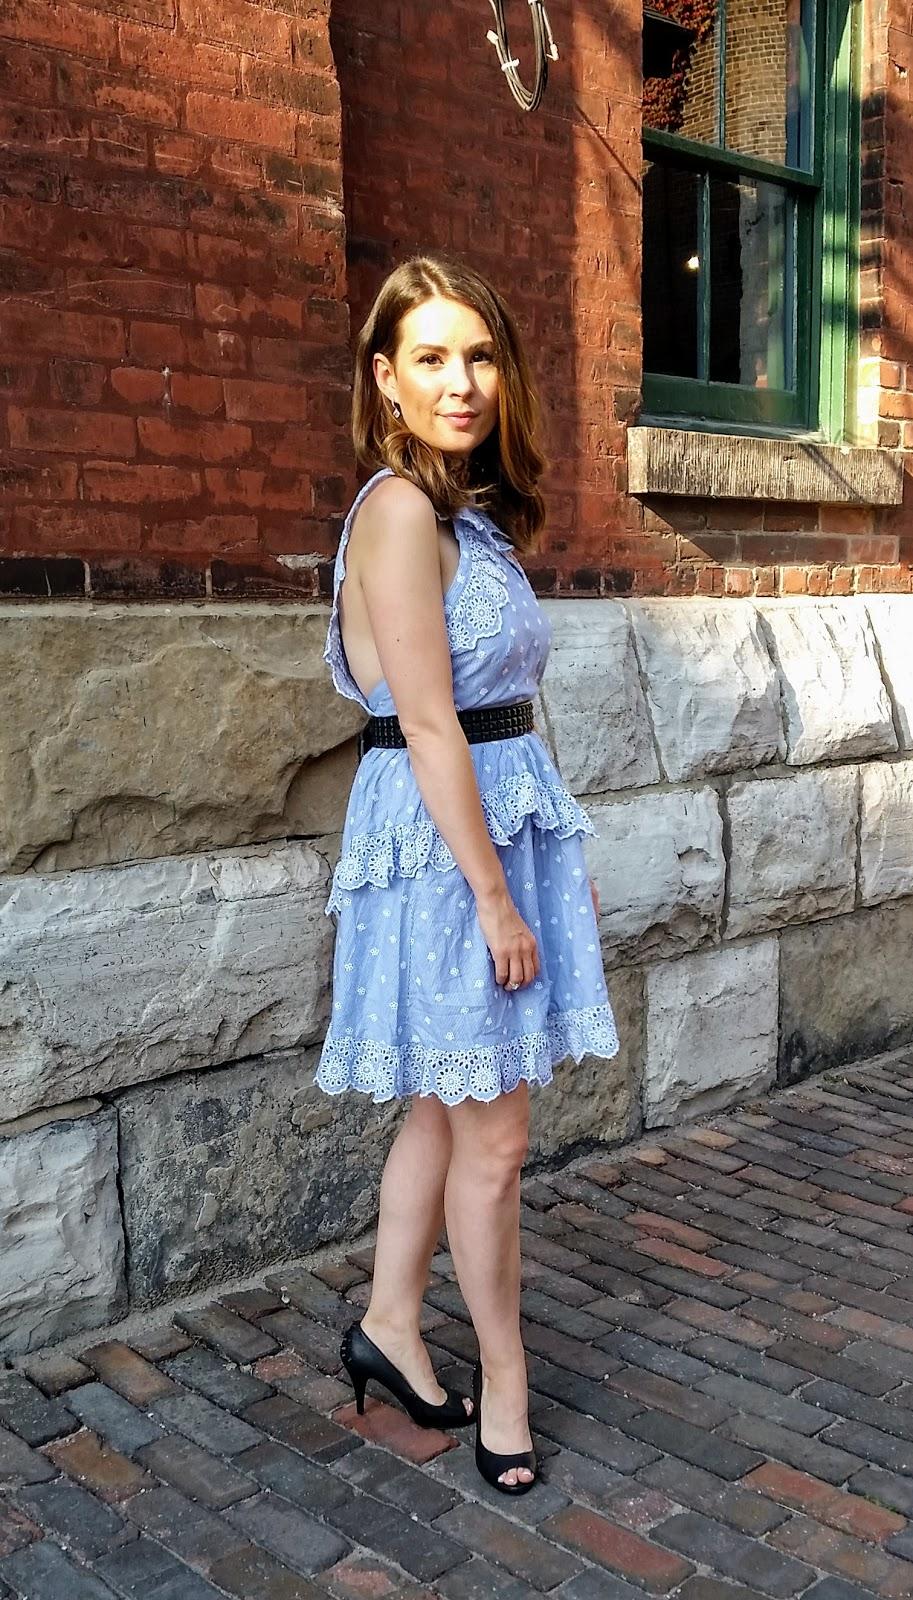 Backless Blue Dress, studded belt, pumps